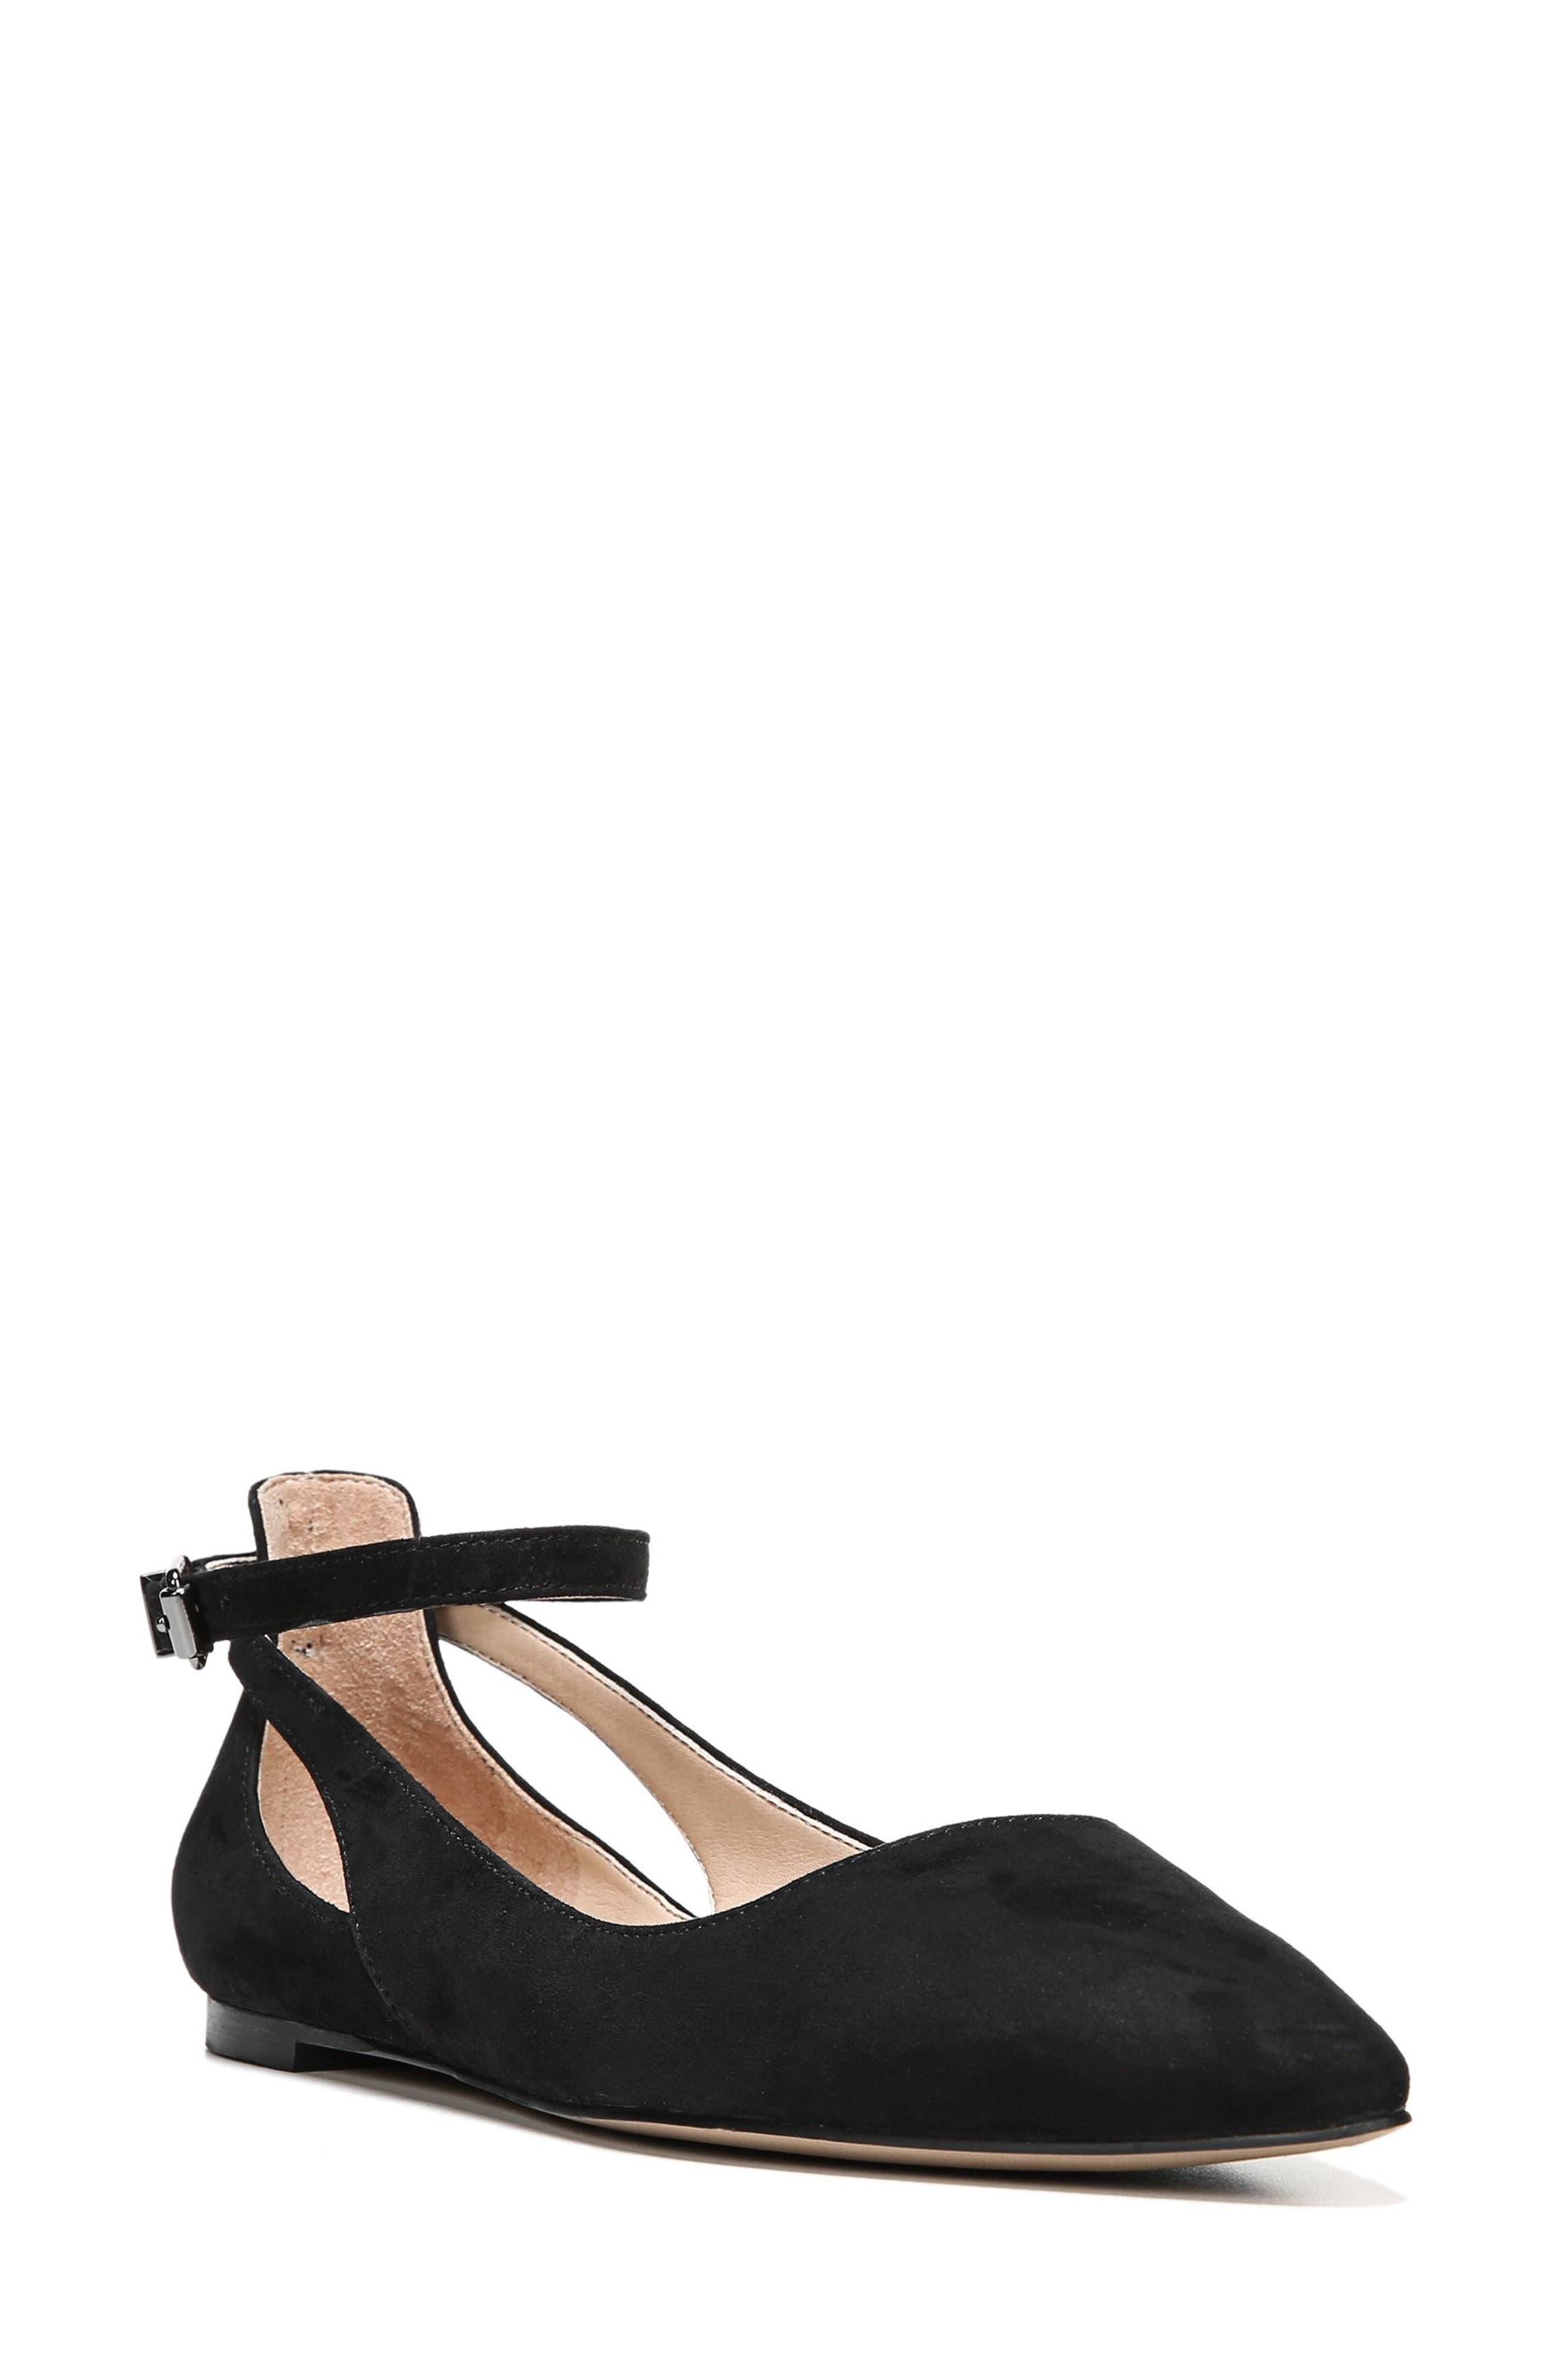 Sylvia Ankle Strap Flat,                             Main thumbnail 1, color,                             Black Suede